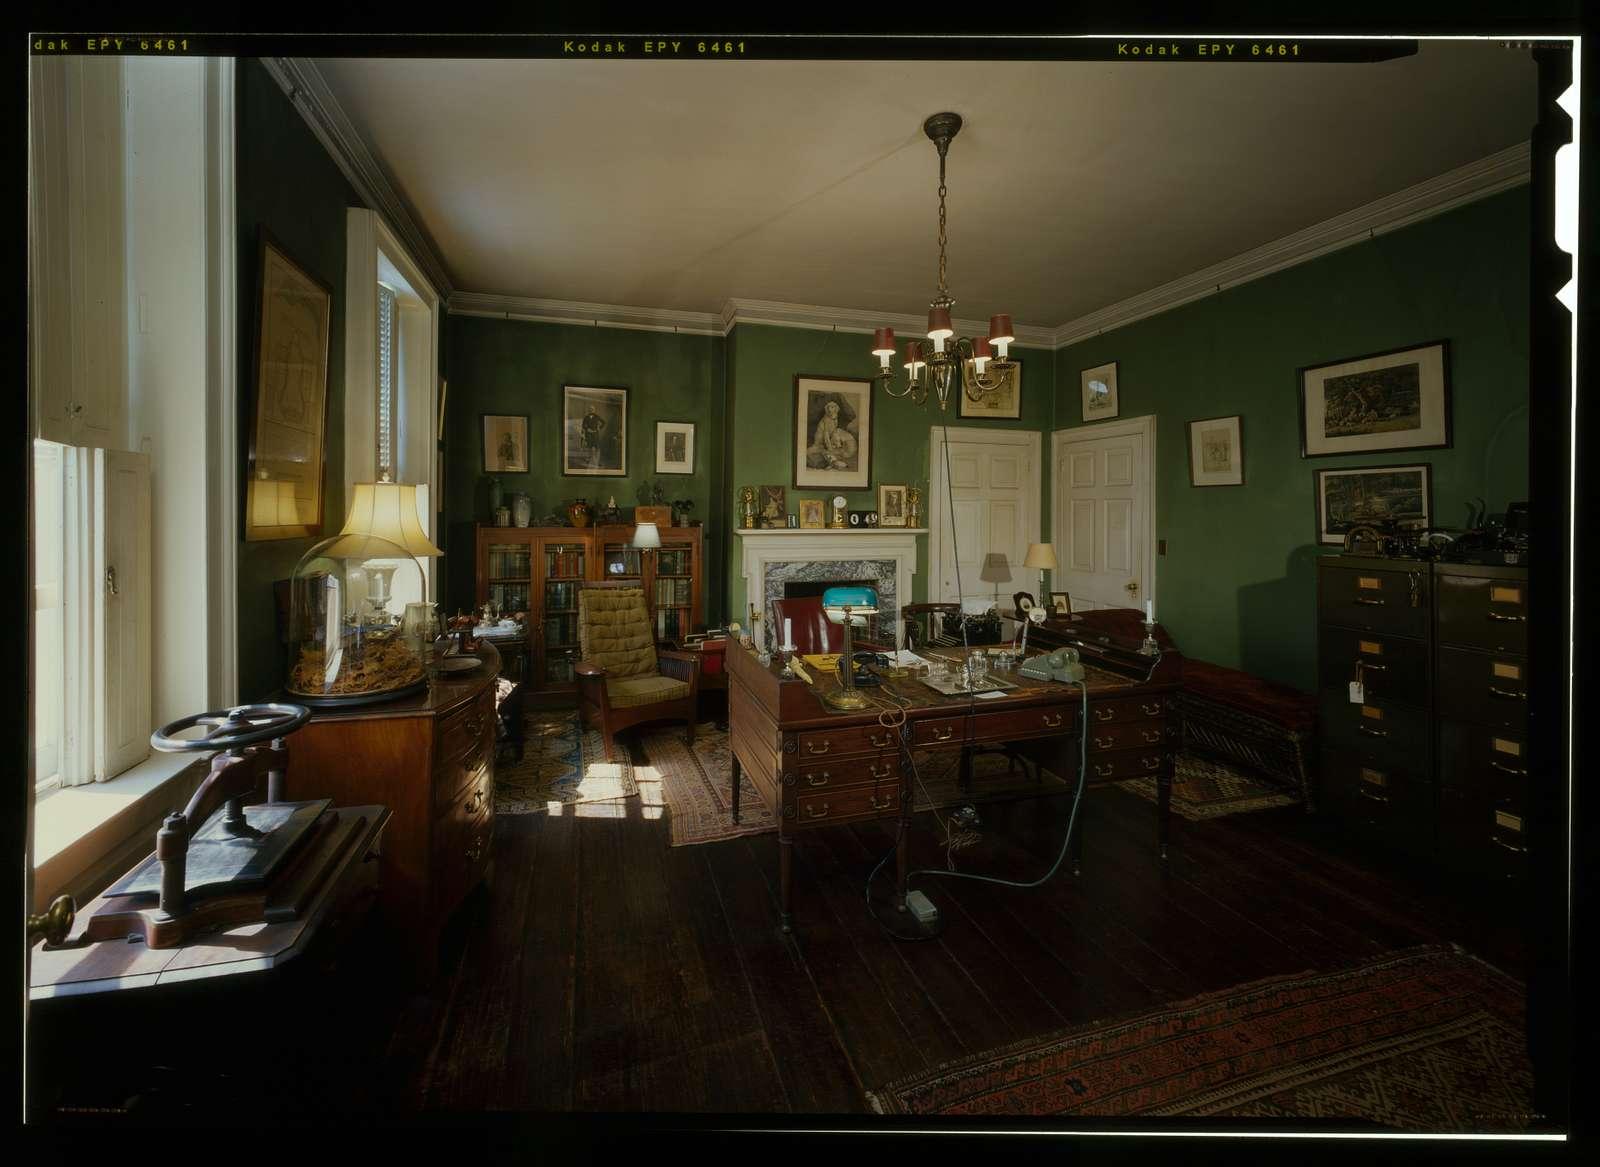 Tudor Place, 1644 Thirty-first Street, Northwest, Washington, District of Columbia, DC